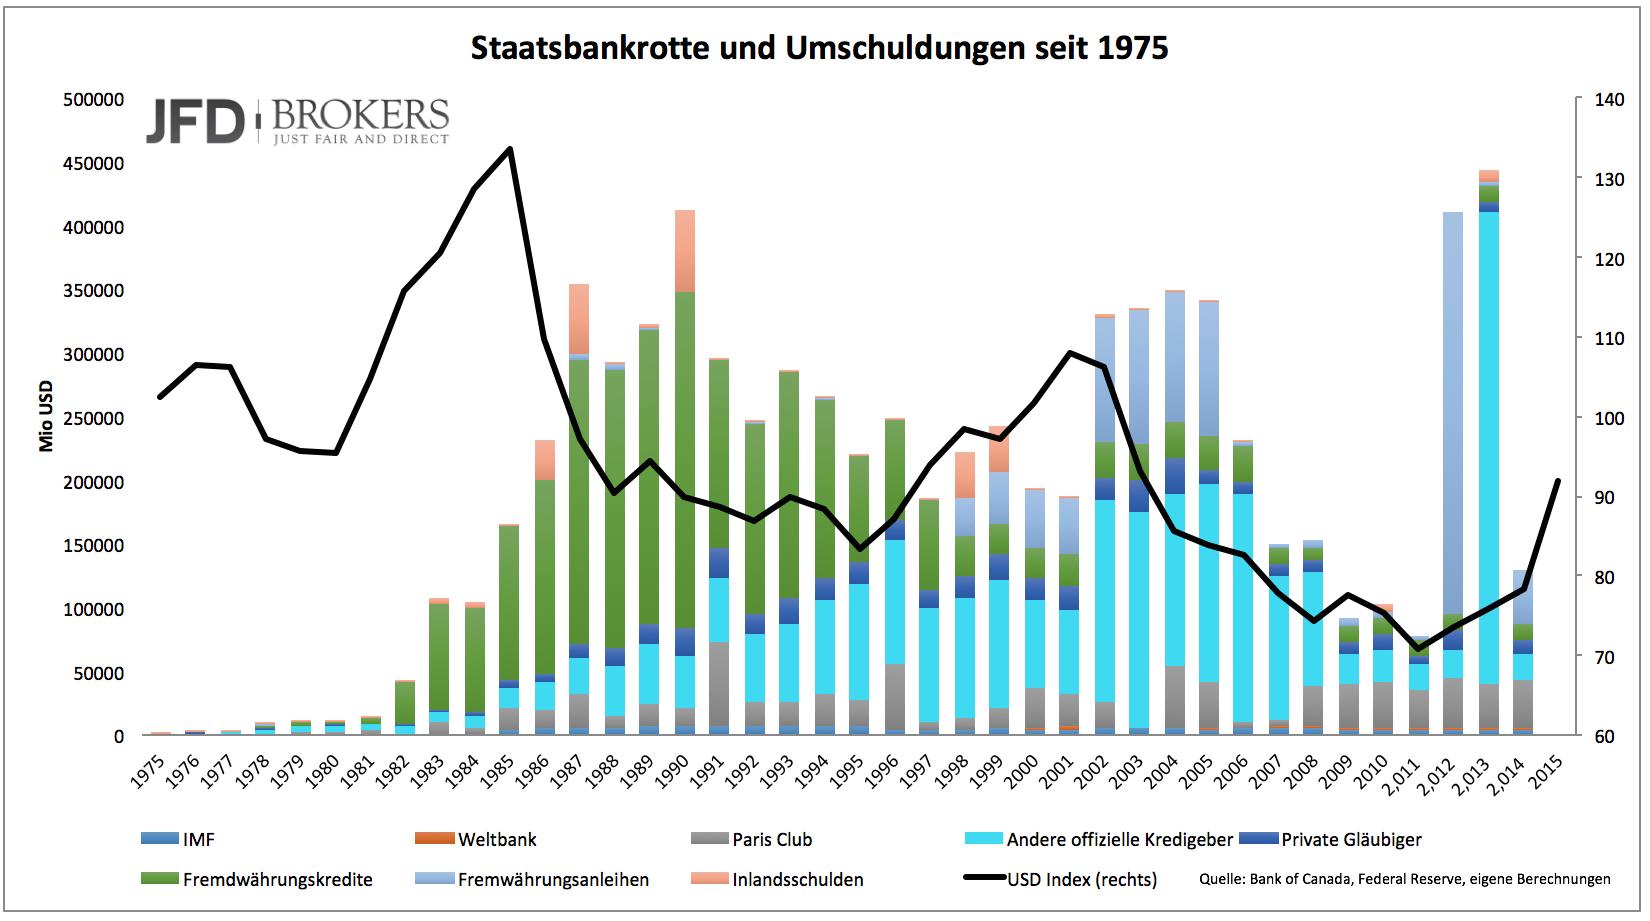 Mehr-Staatsbankrotte-ab-2016-Kommentar-JFD-Brokers-GodmodeTrader.de-1